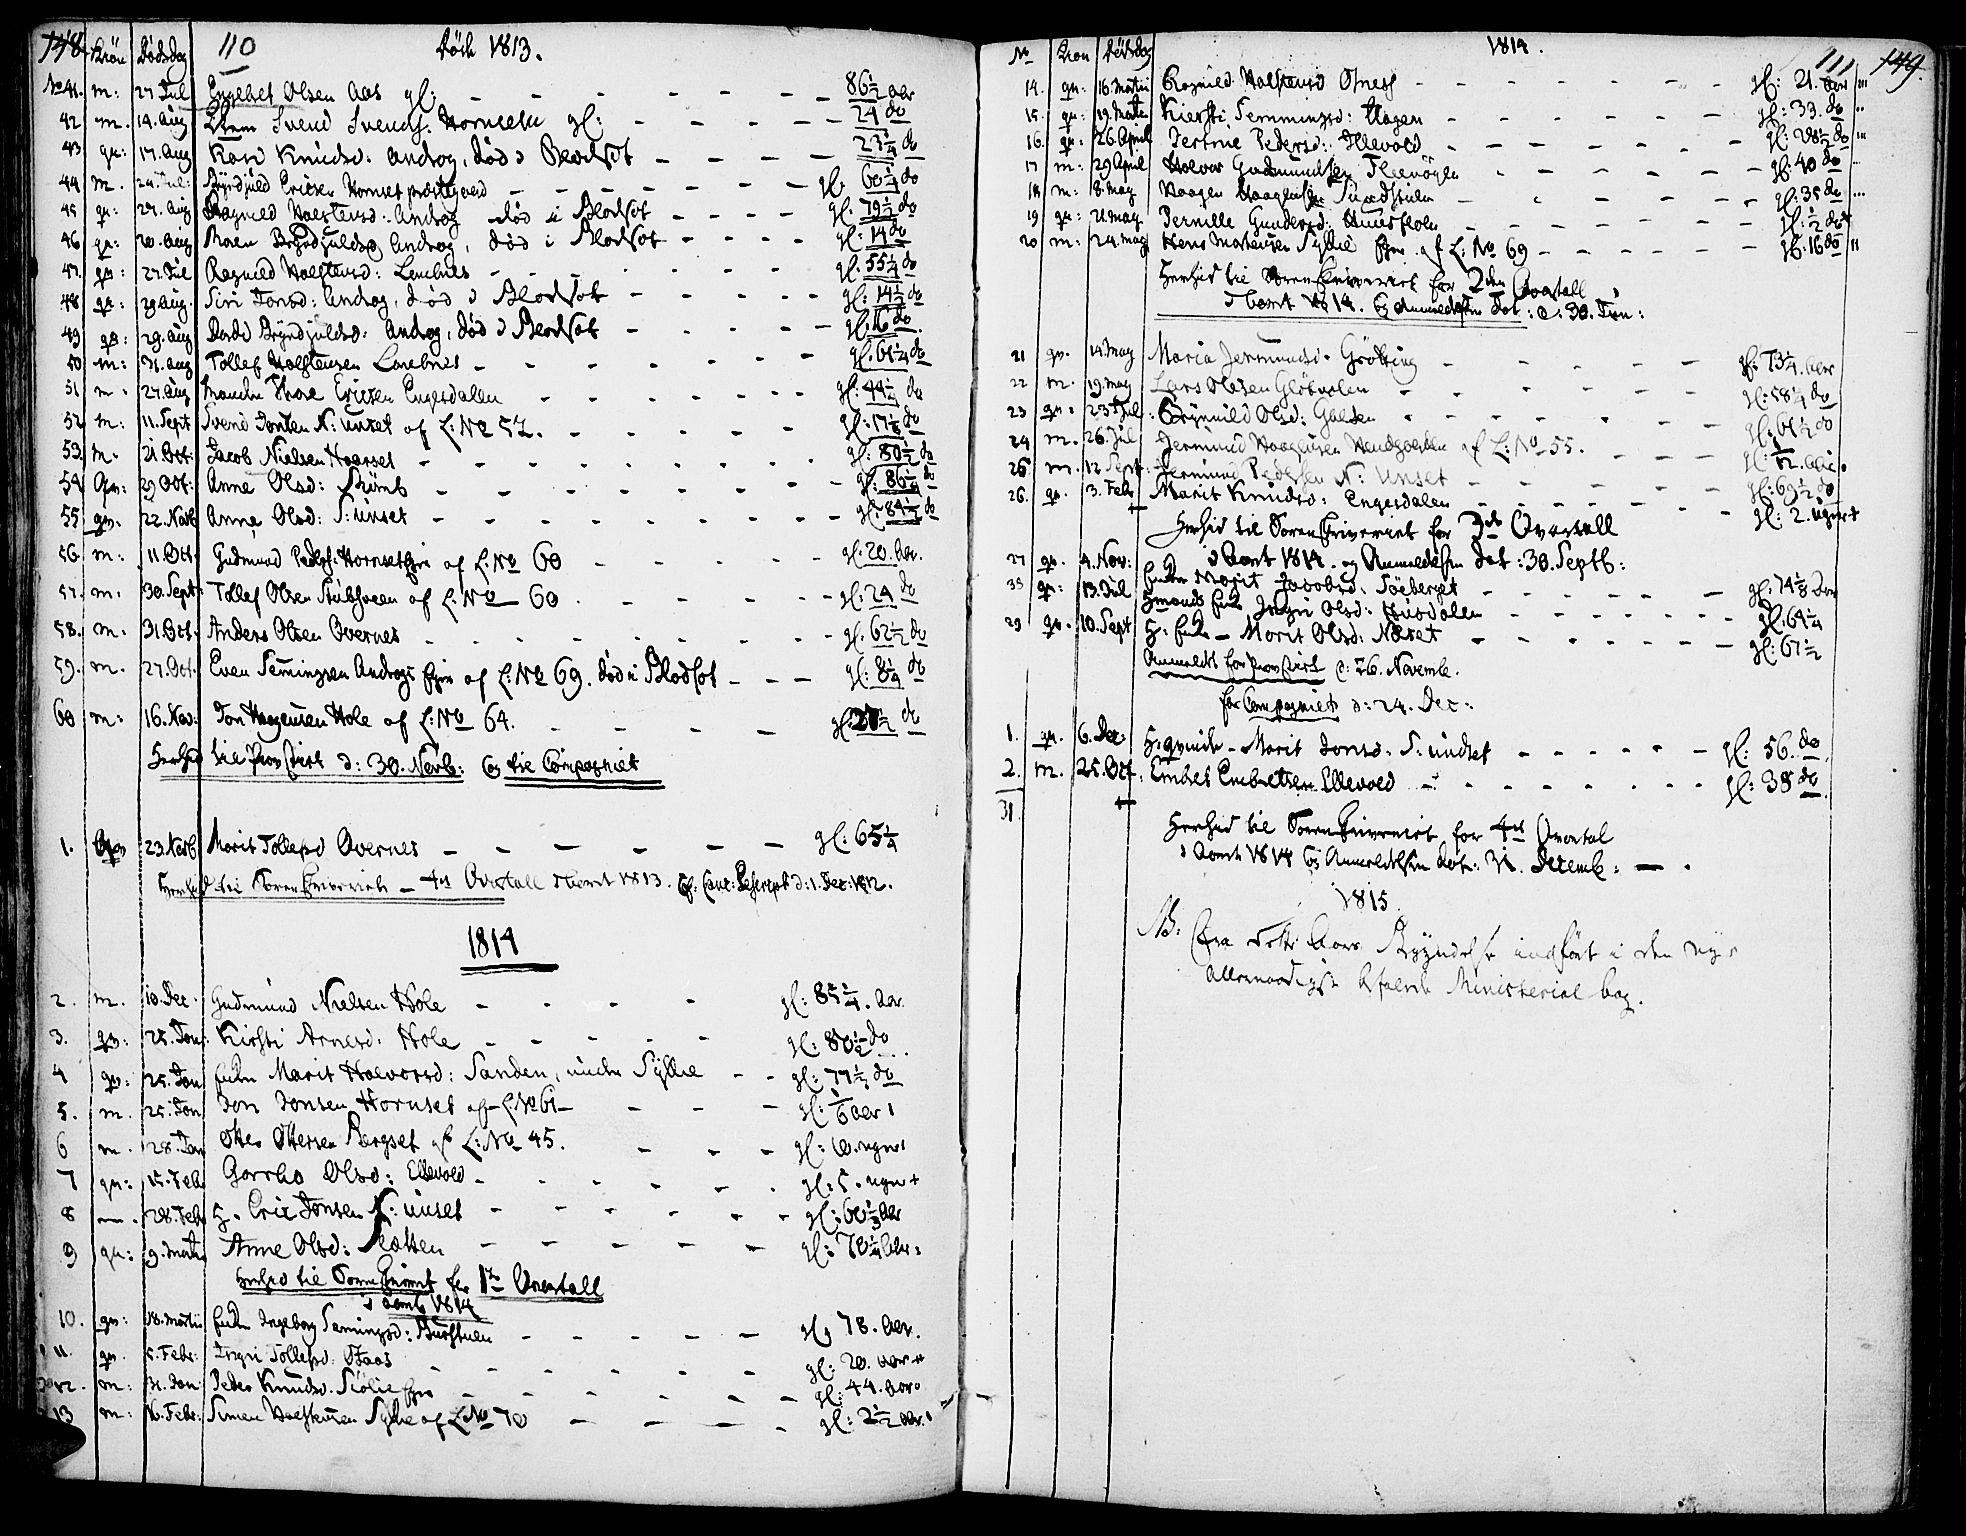 SAH, Rendalen prestekontor, H/Ha/Haa/L0002: Ministerialbok nr. 2, 1788-1814, s. 110-111